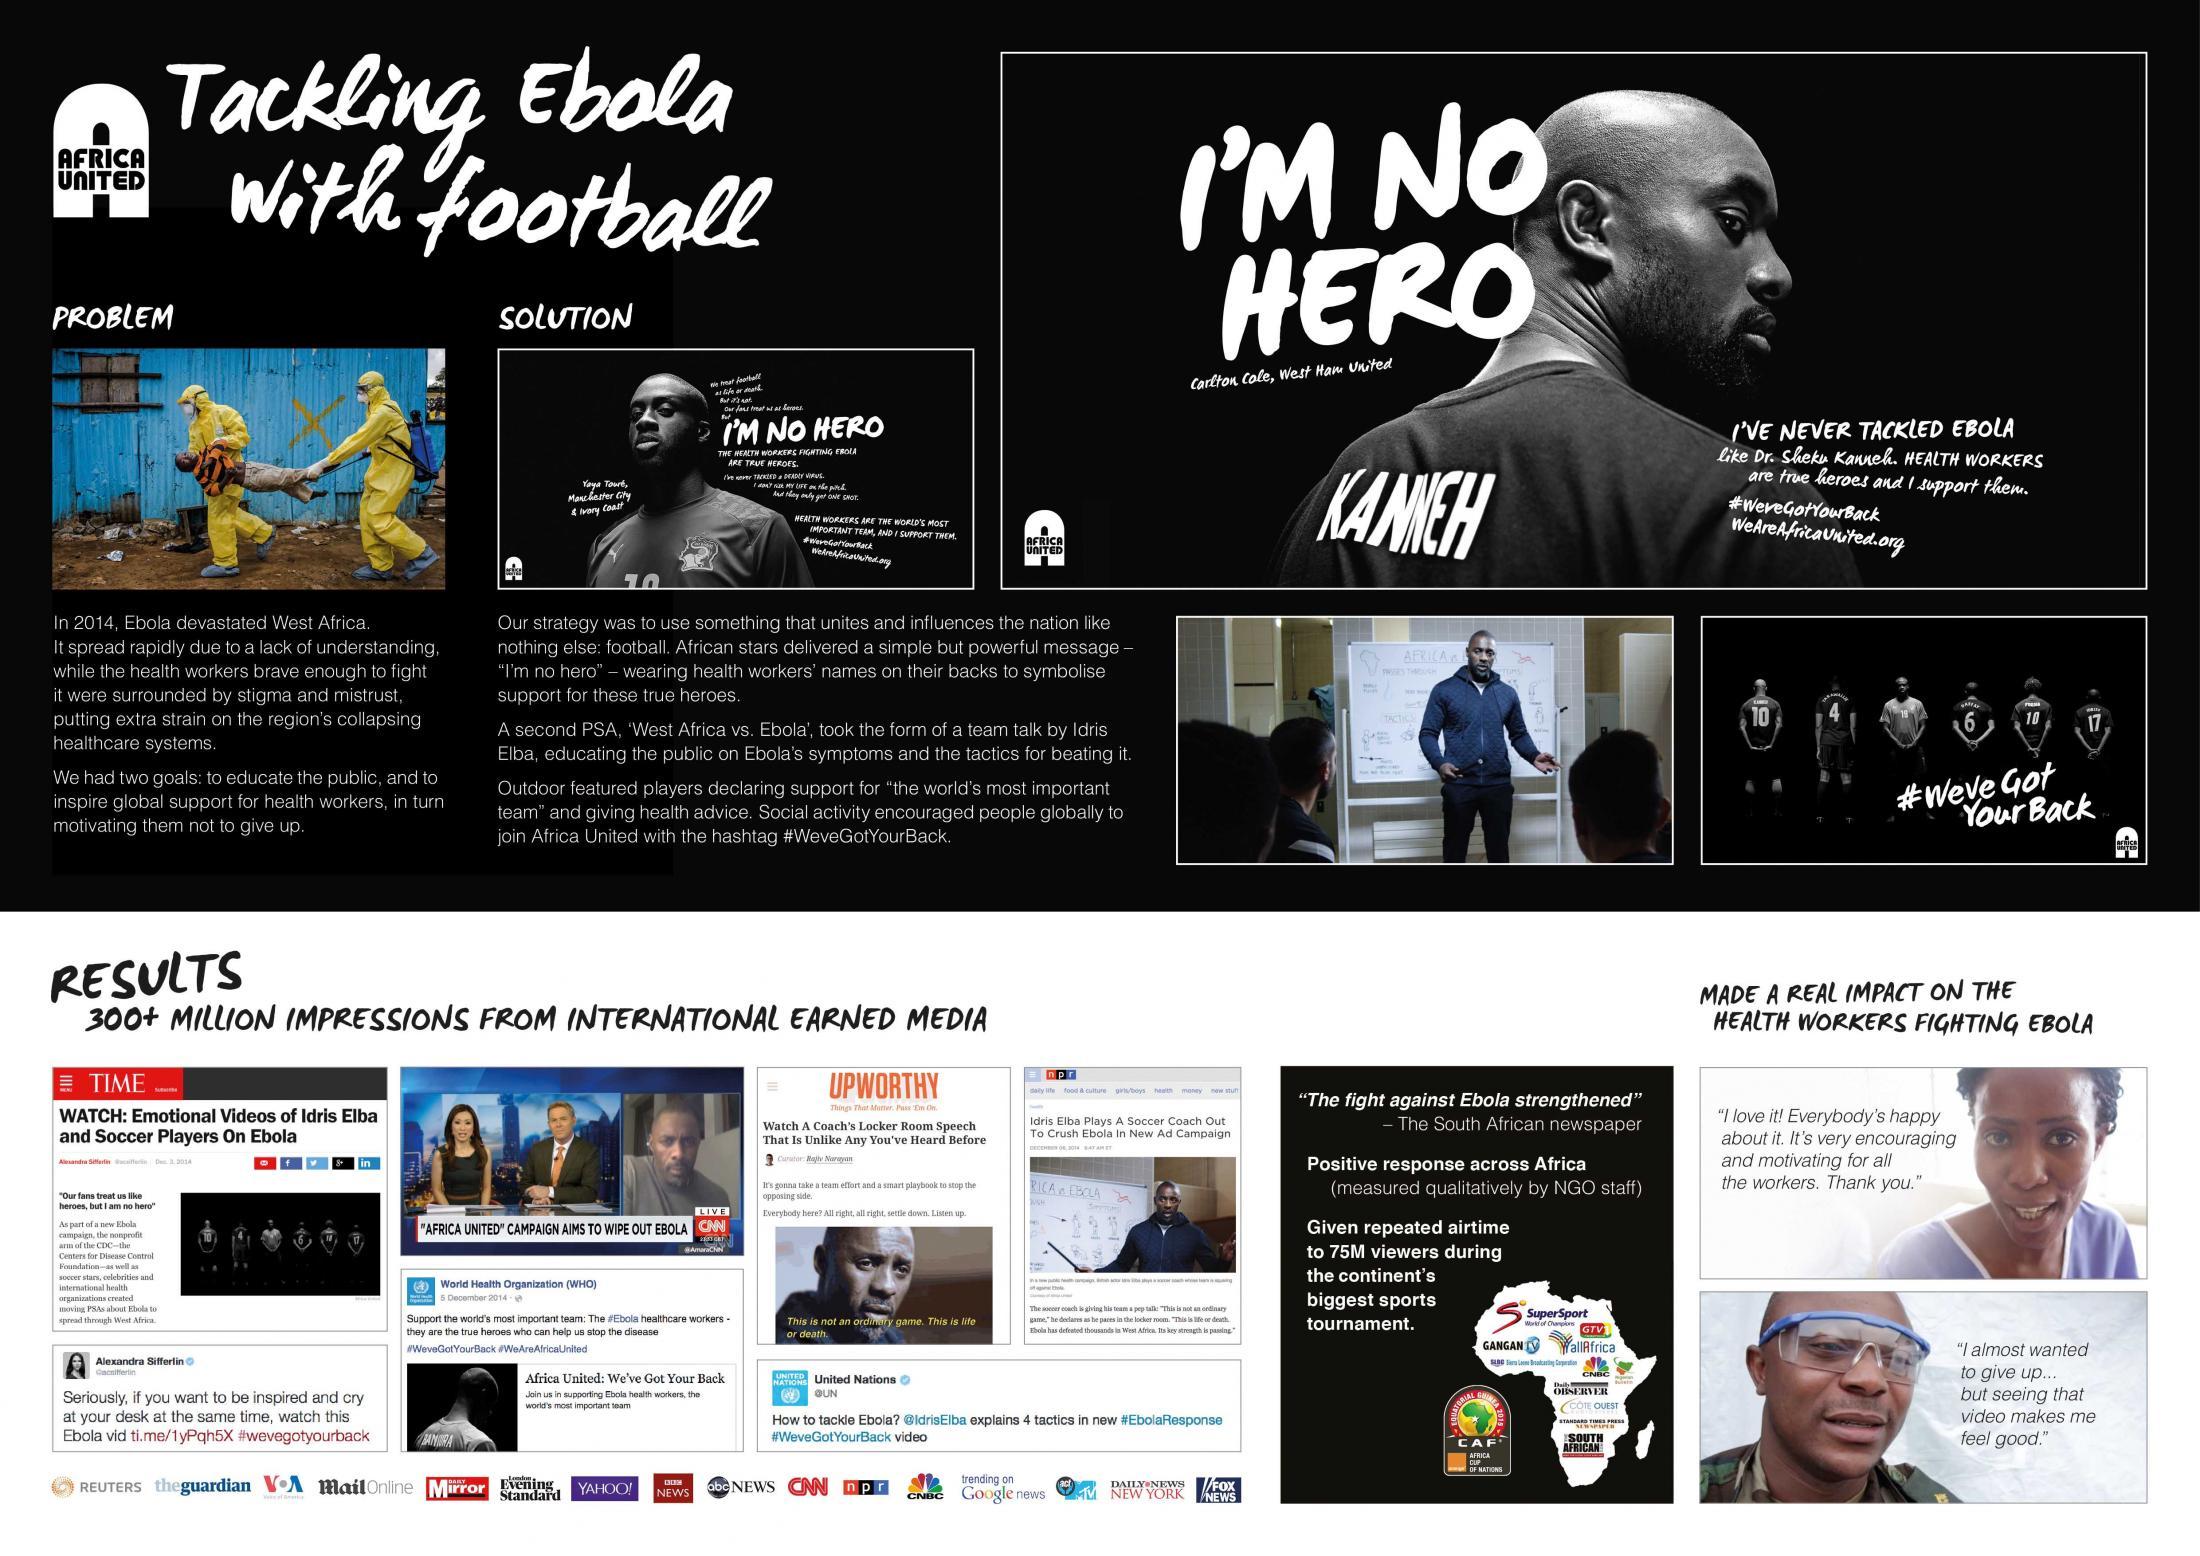 Thumbnail for Africa United - We've Got Your Back